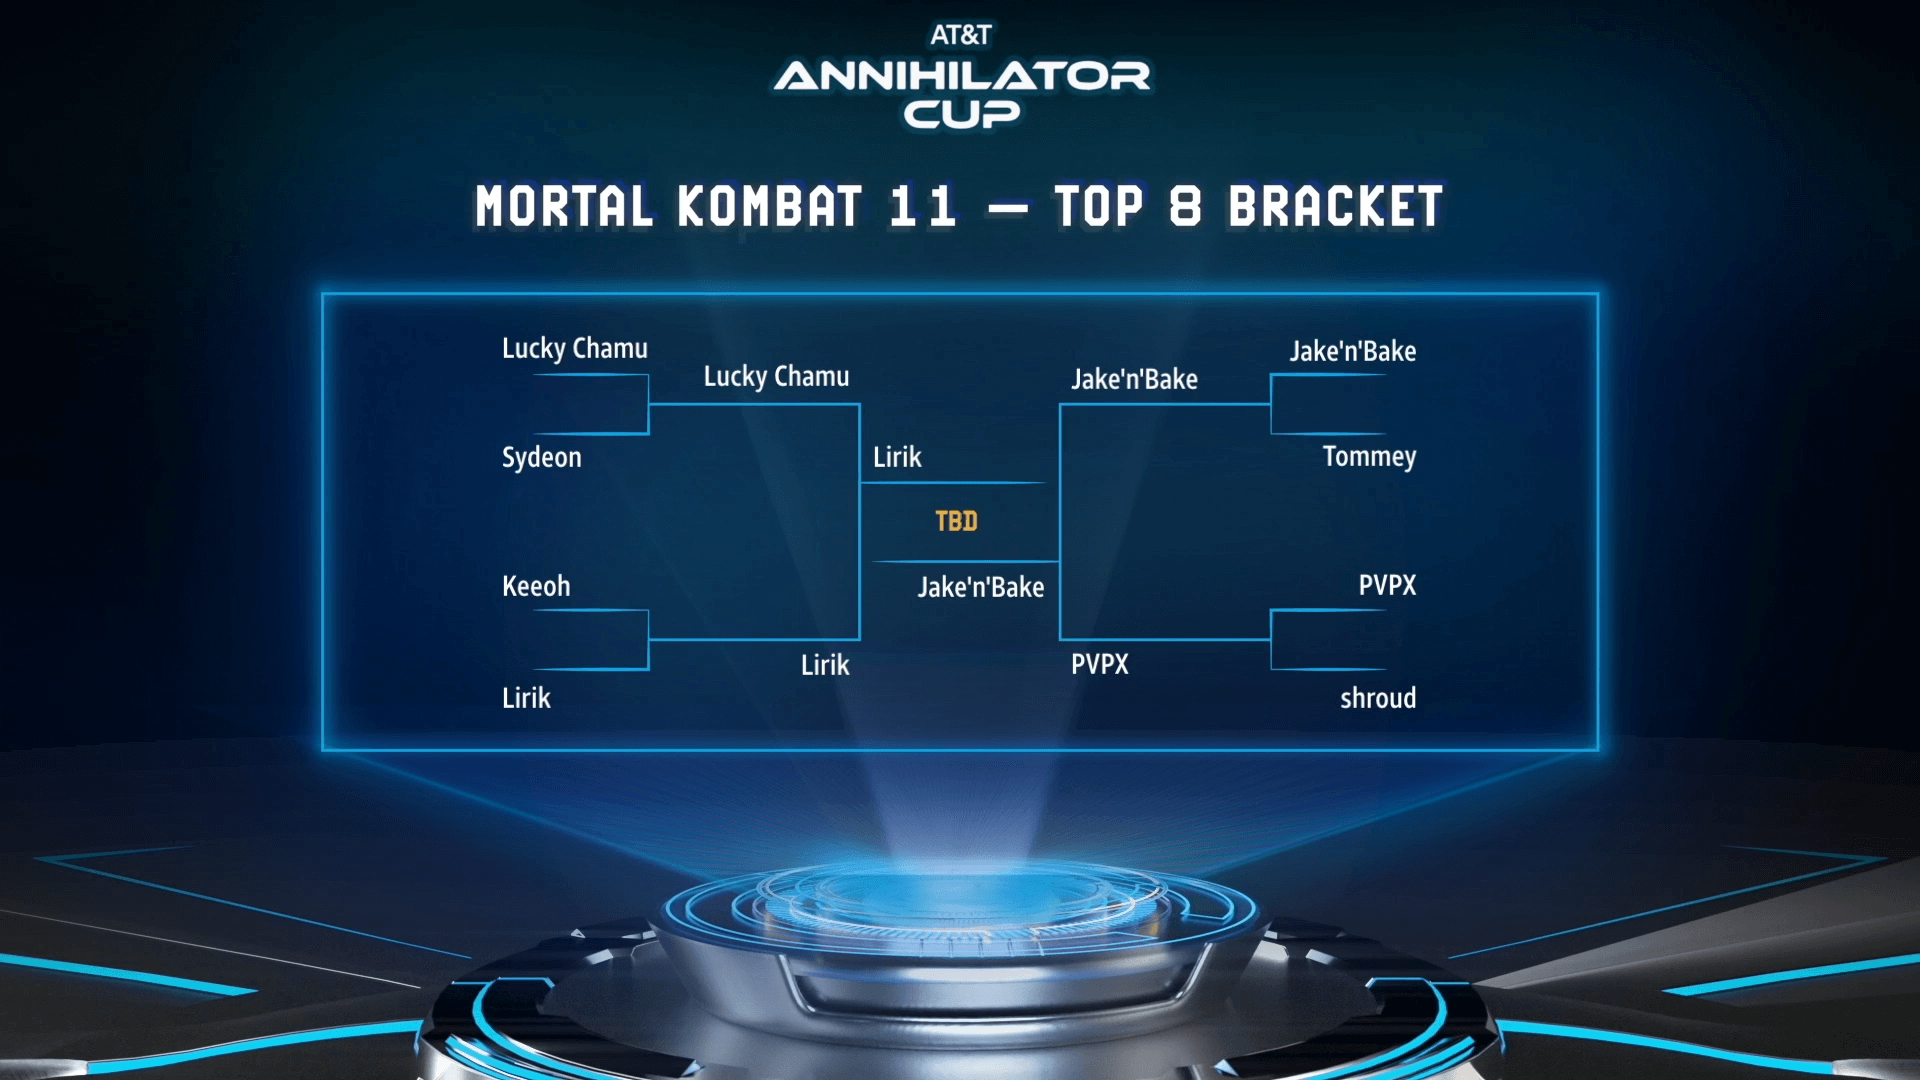 AT&T Cup Mortal Kombat Bracket Round 2 results